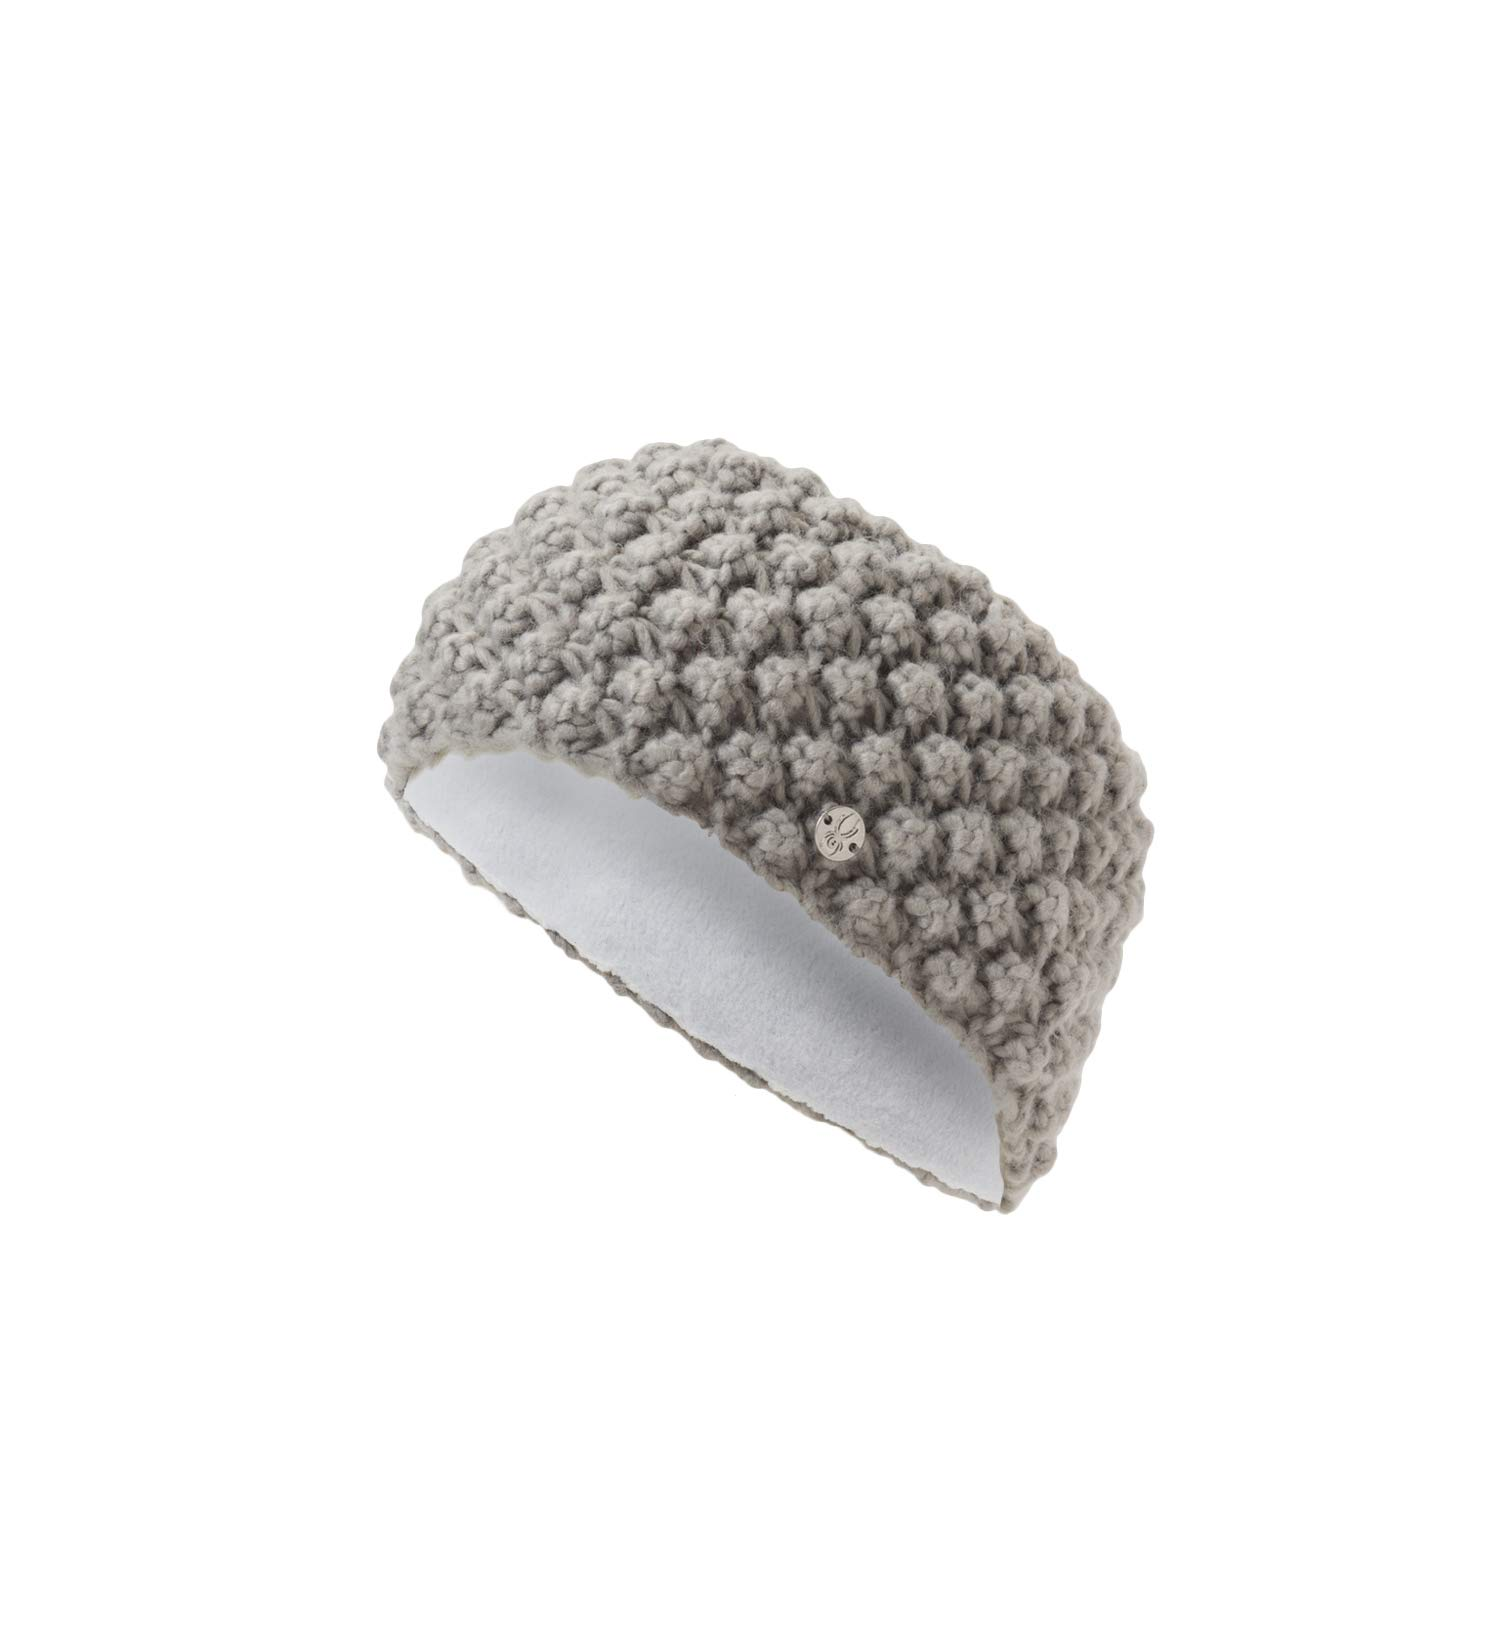 Spyder Women's Brrr Berry Headband, Alloy/Alloy, One Size by Spyder